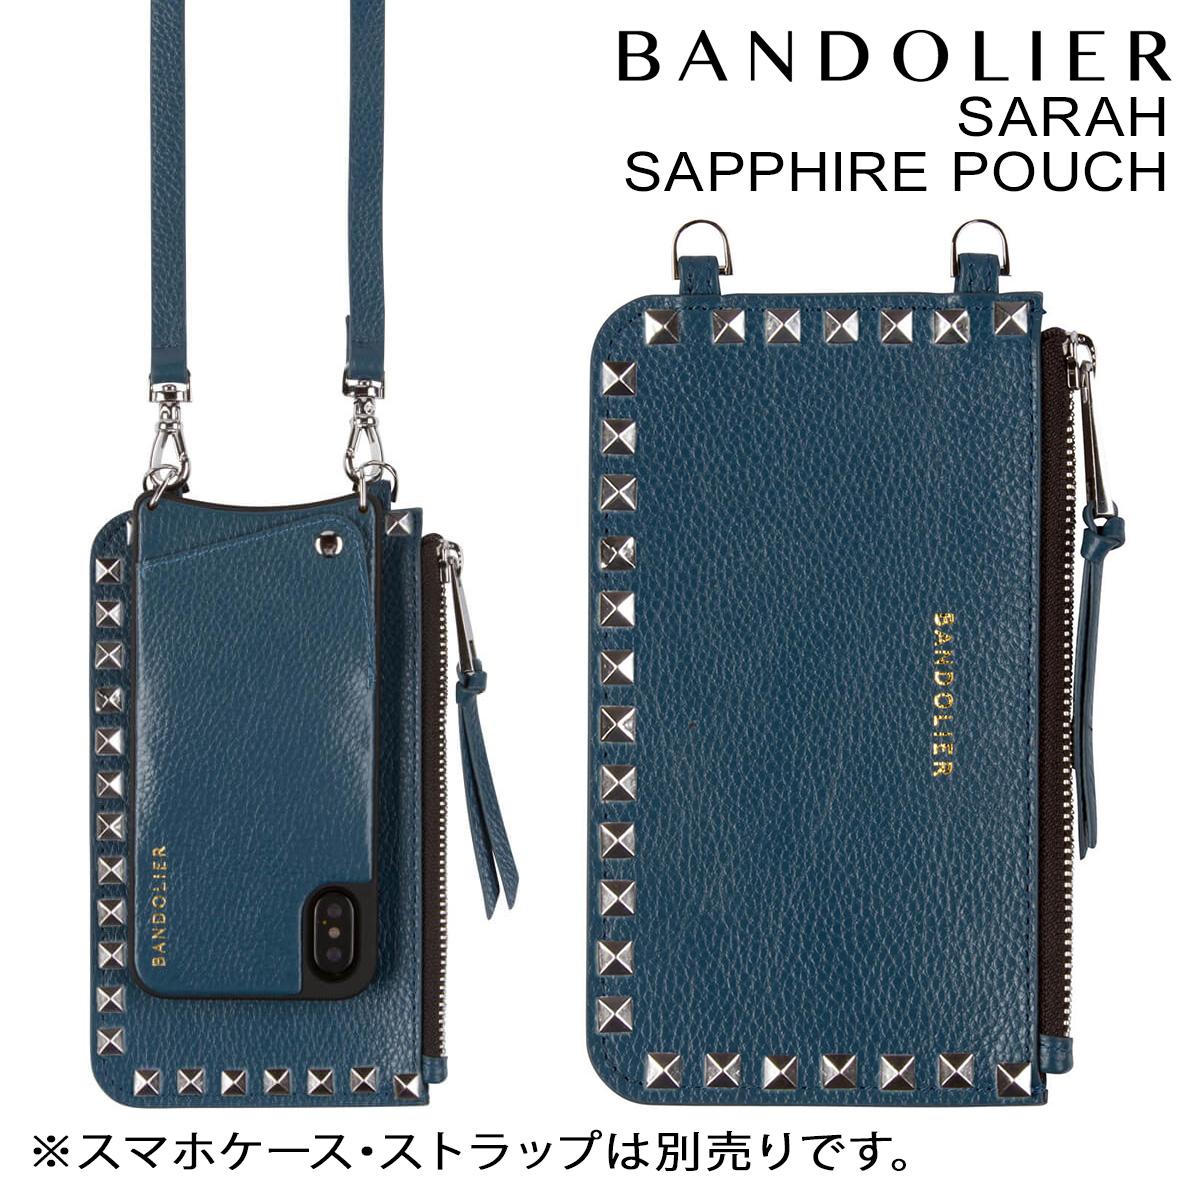 BANDOLIER バンドリヤー ポーチ SARAH SAPPHIRE POUCH レザー メンズ レディース ブルー [9/20 新入荷]